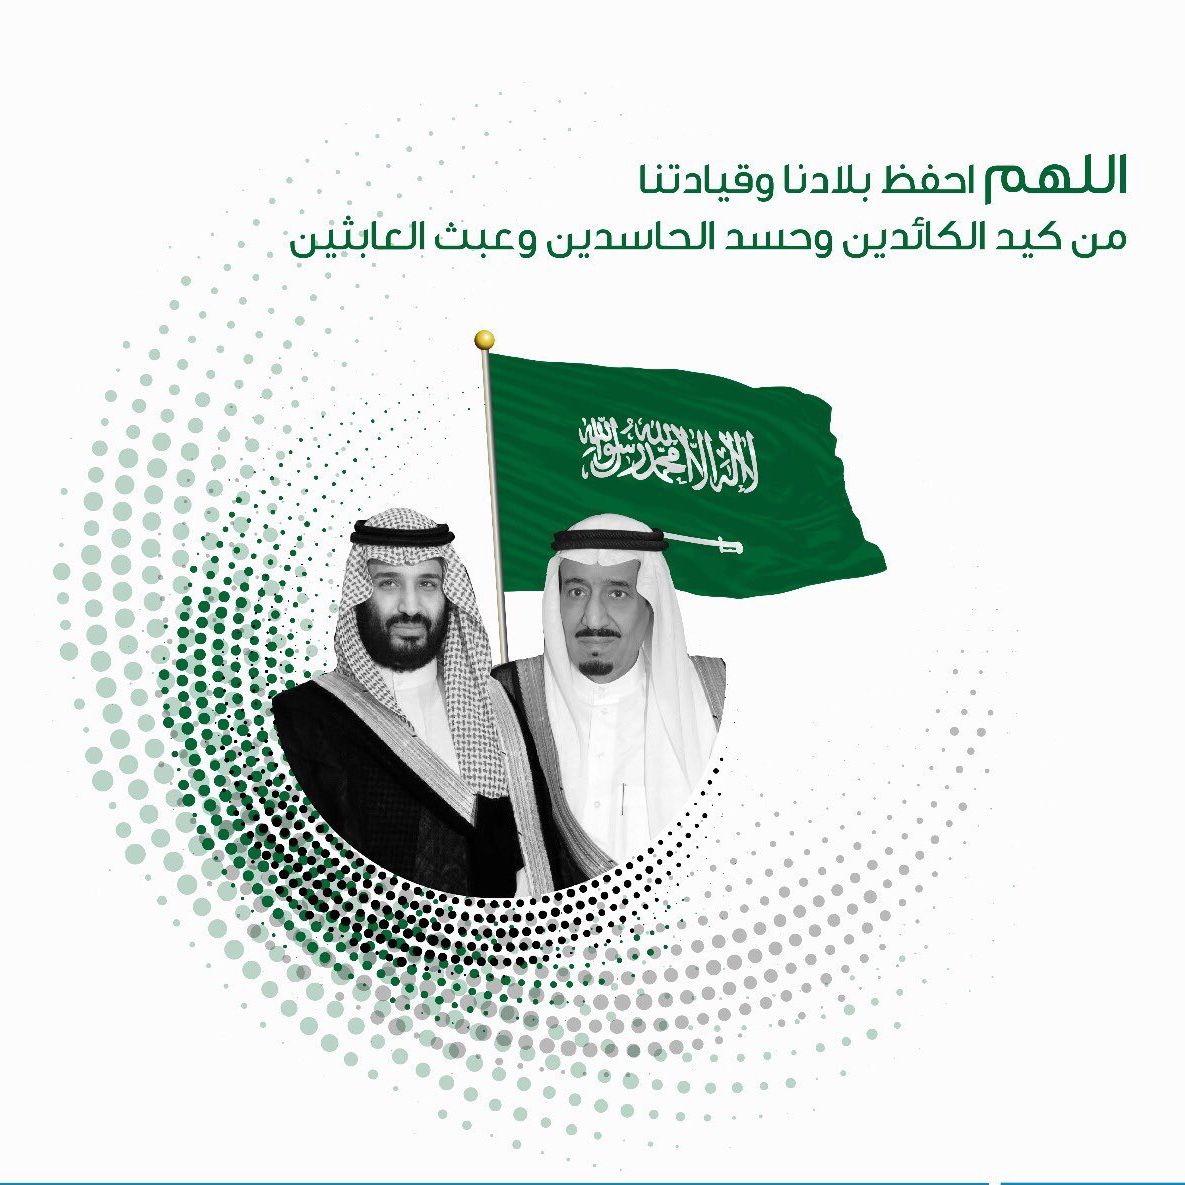 Pin By Mohammed Bokar On الملك سلمان بن عبدالعزيز ال سعود وولي العهد سمو الامير محمد بن سلمان حفظهما الله National Day Saudi Happy National Day Saudi Flag